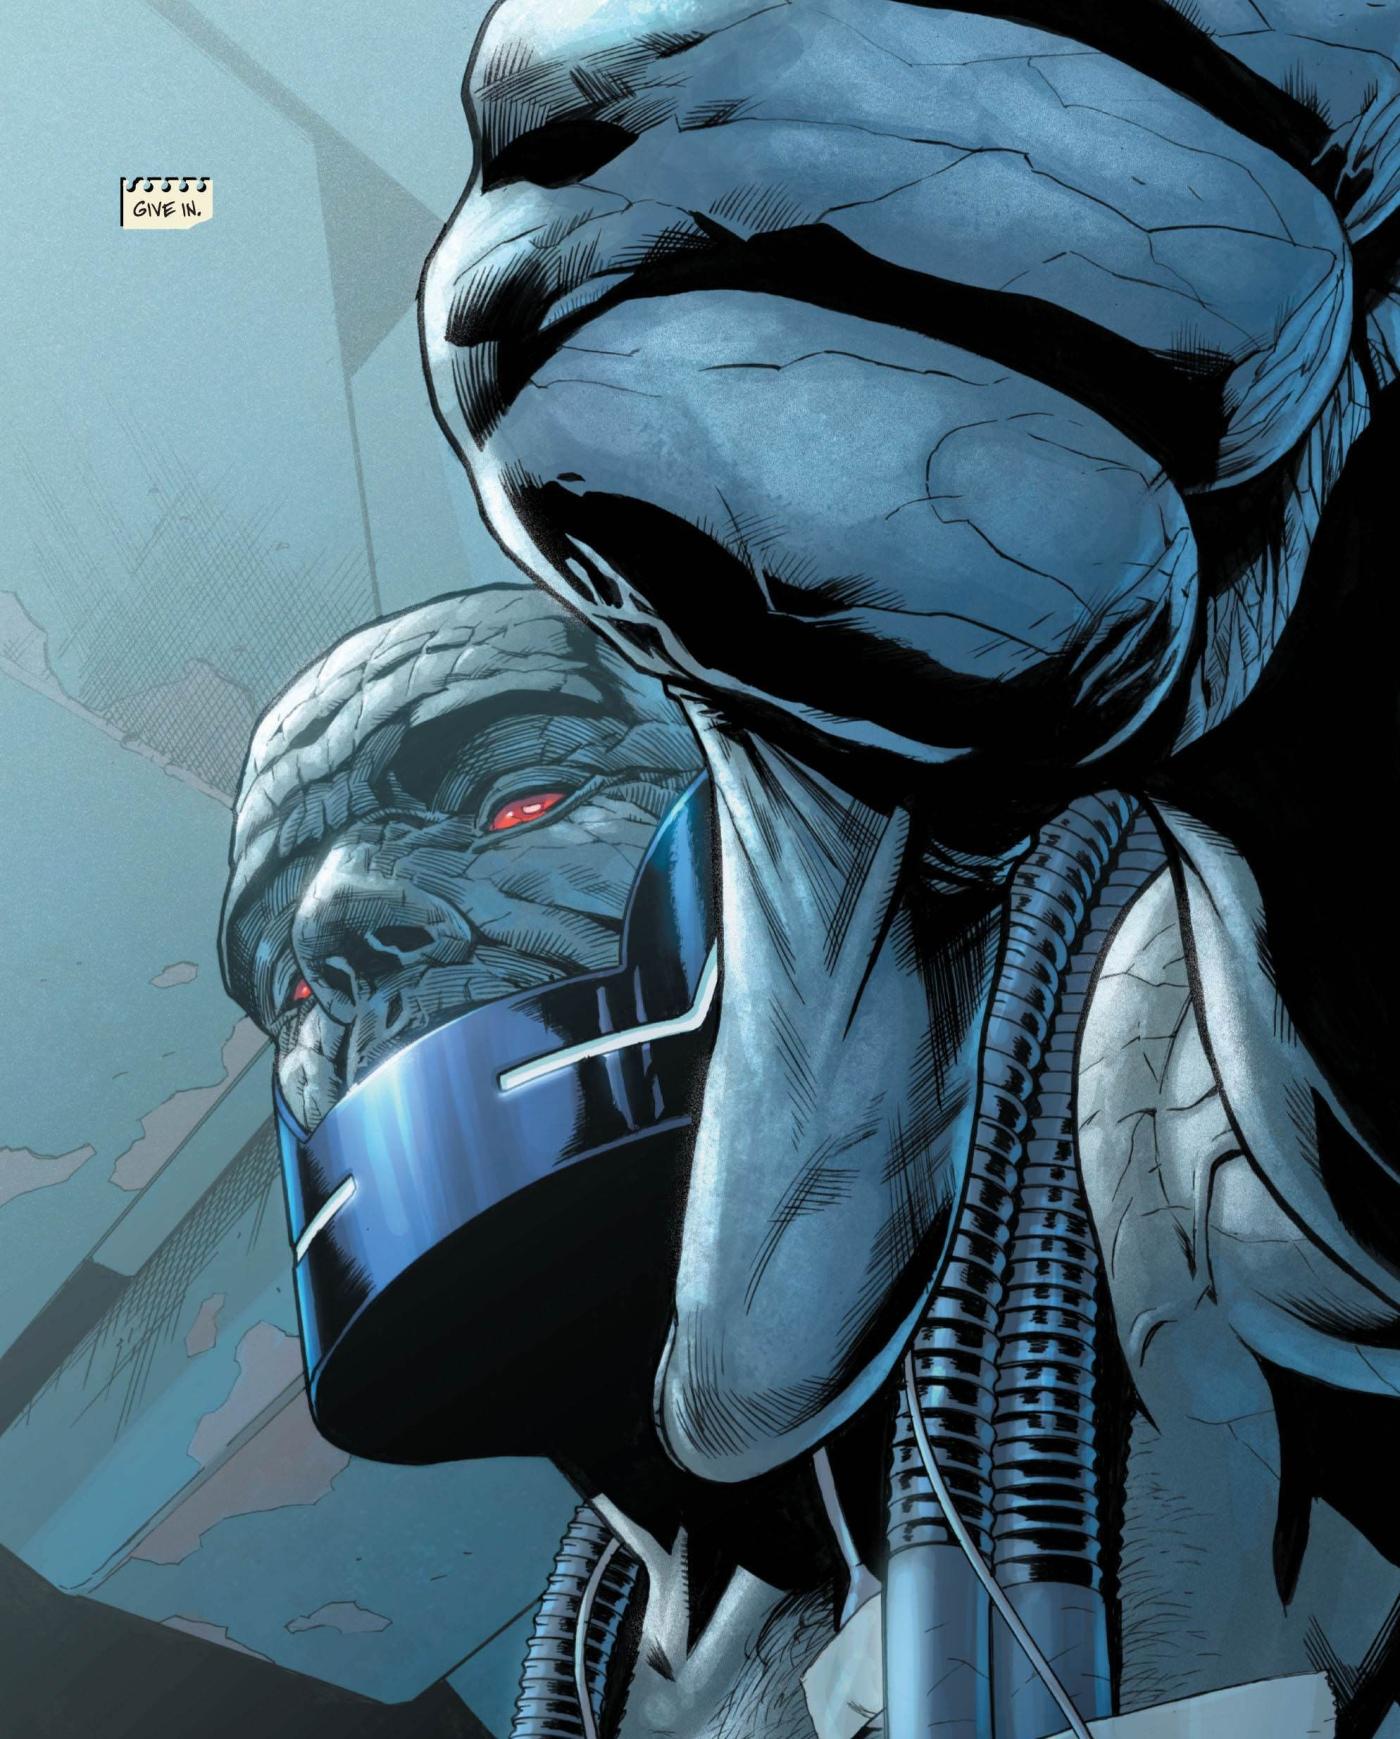 JG Jones Darkseid Final Crisis